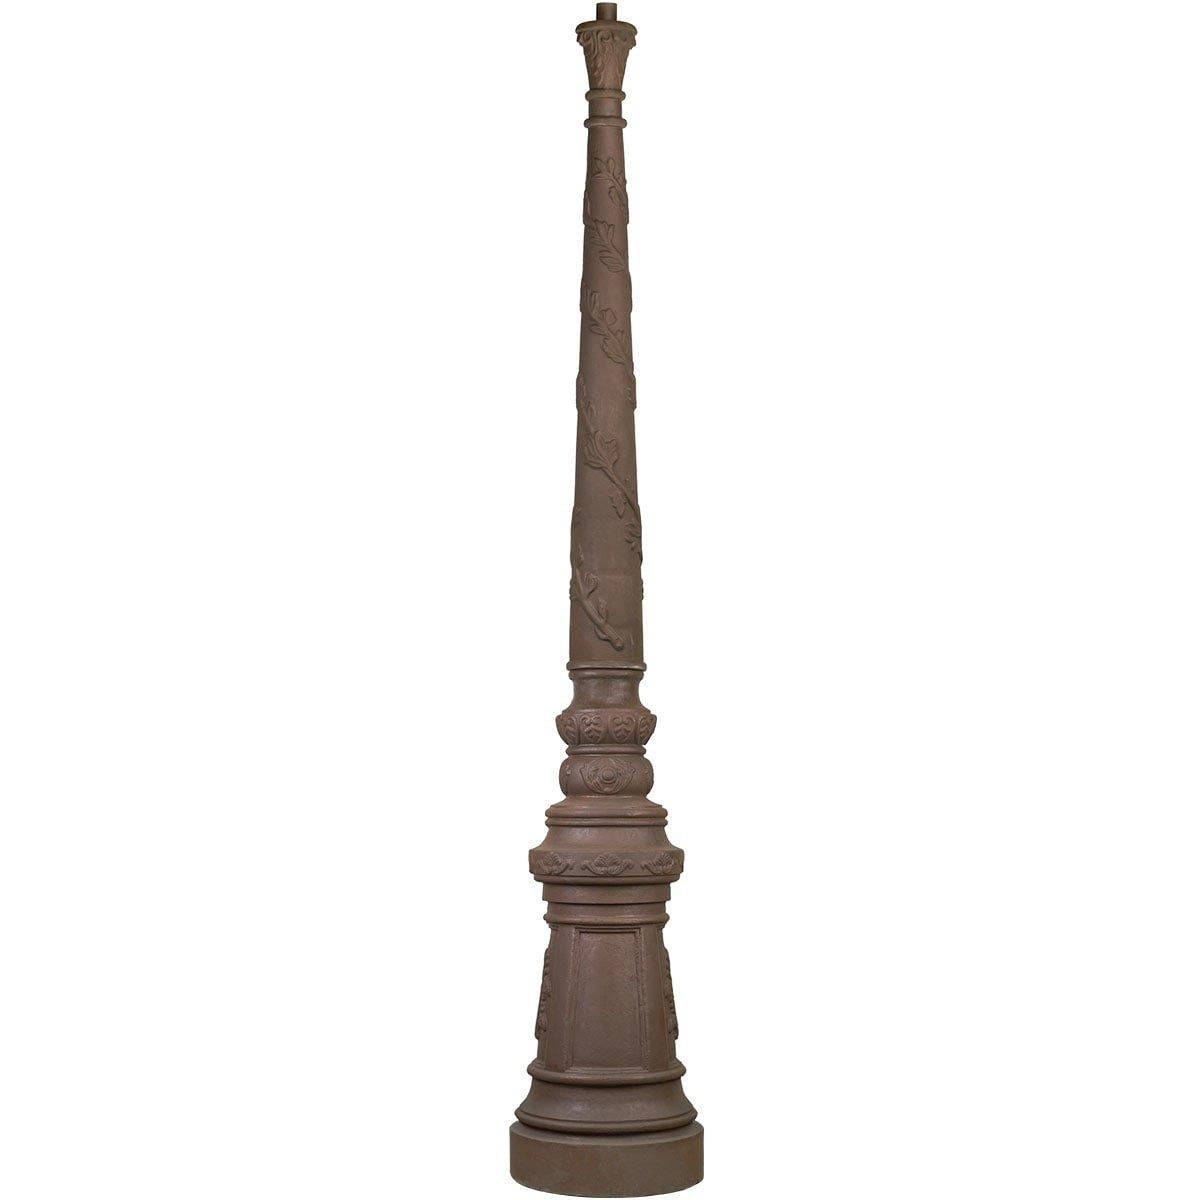 Outdoor Lighting Components Loose lantern pole cast iron M01 - 240 cm